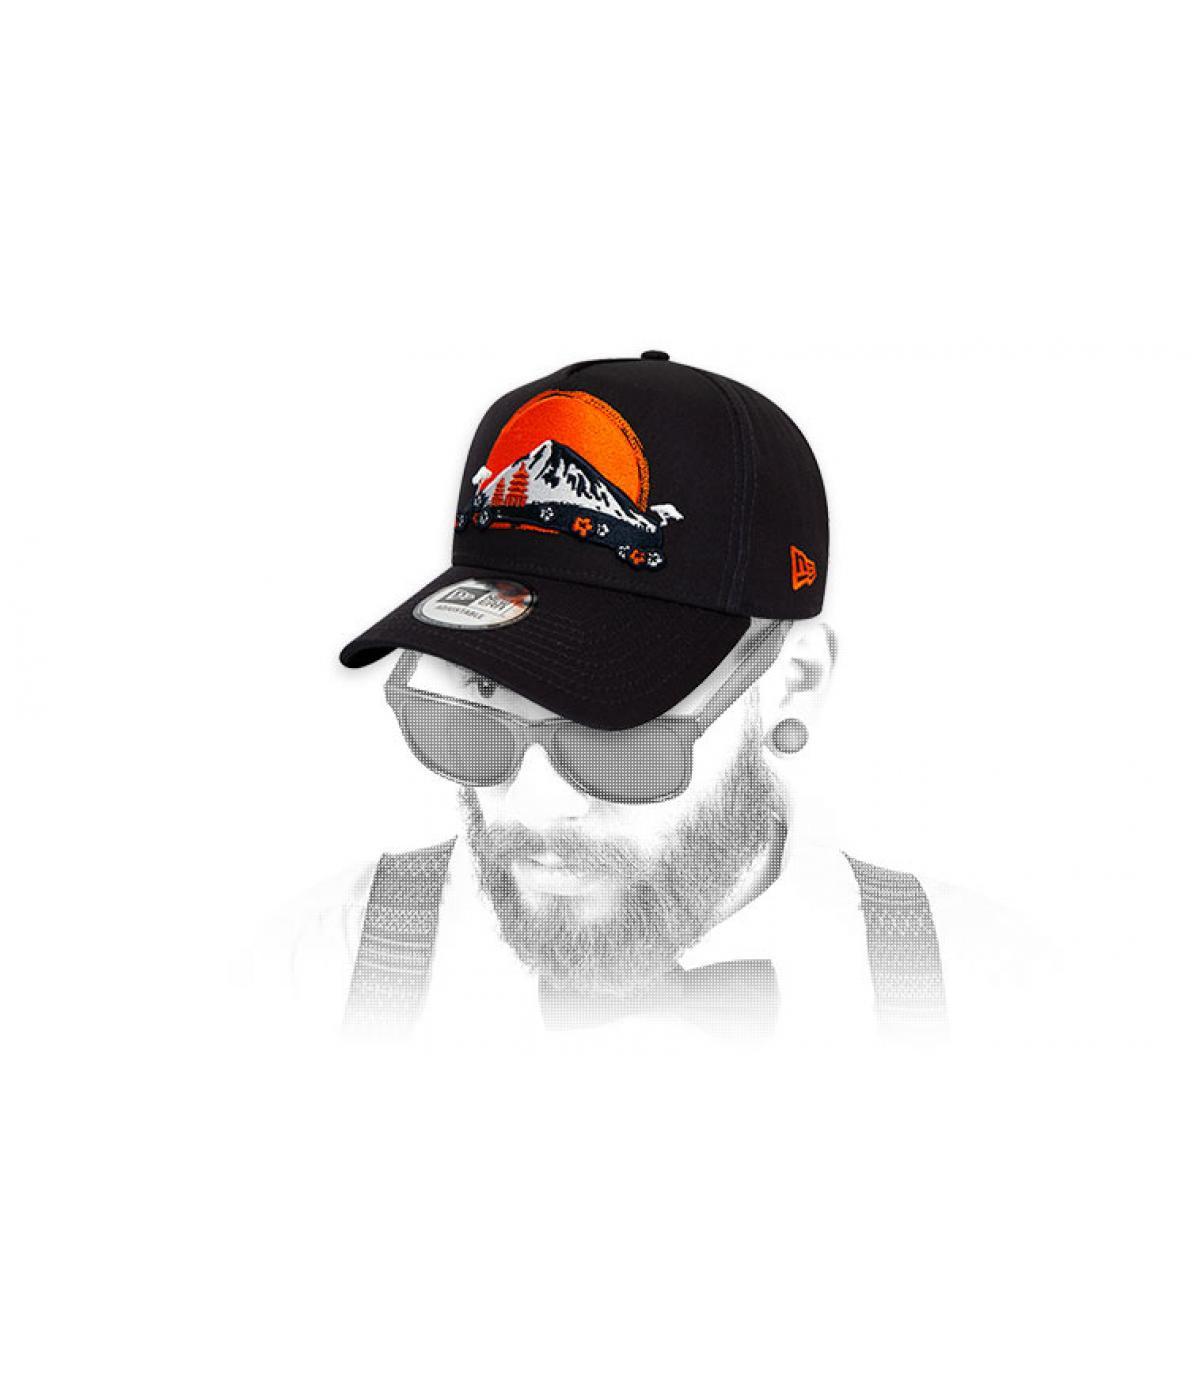 blue New Era embroidered cap